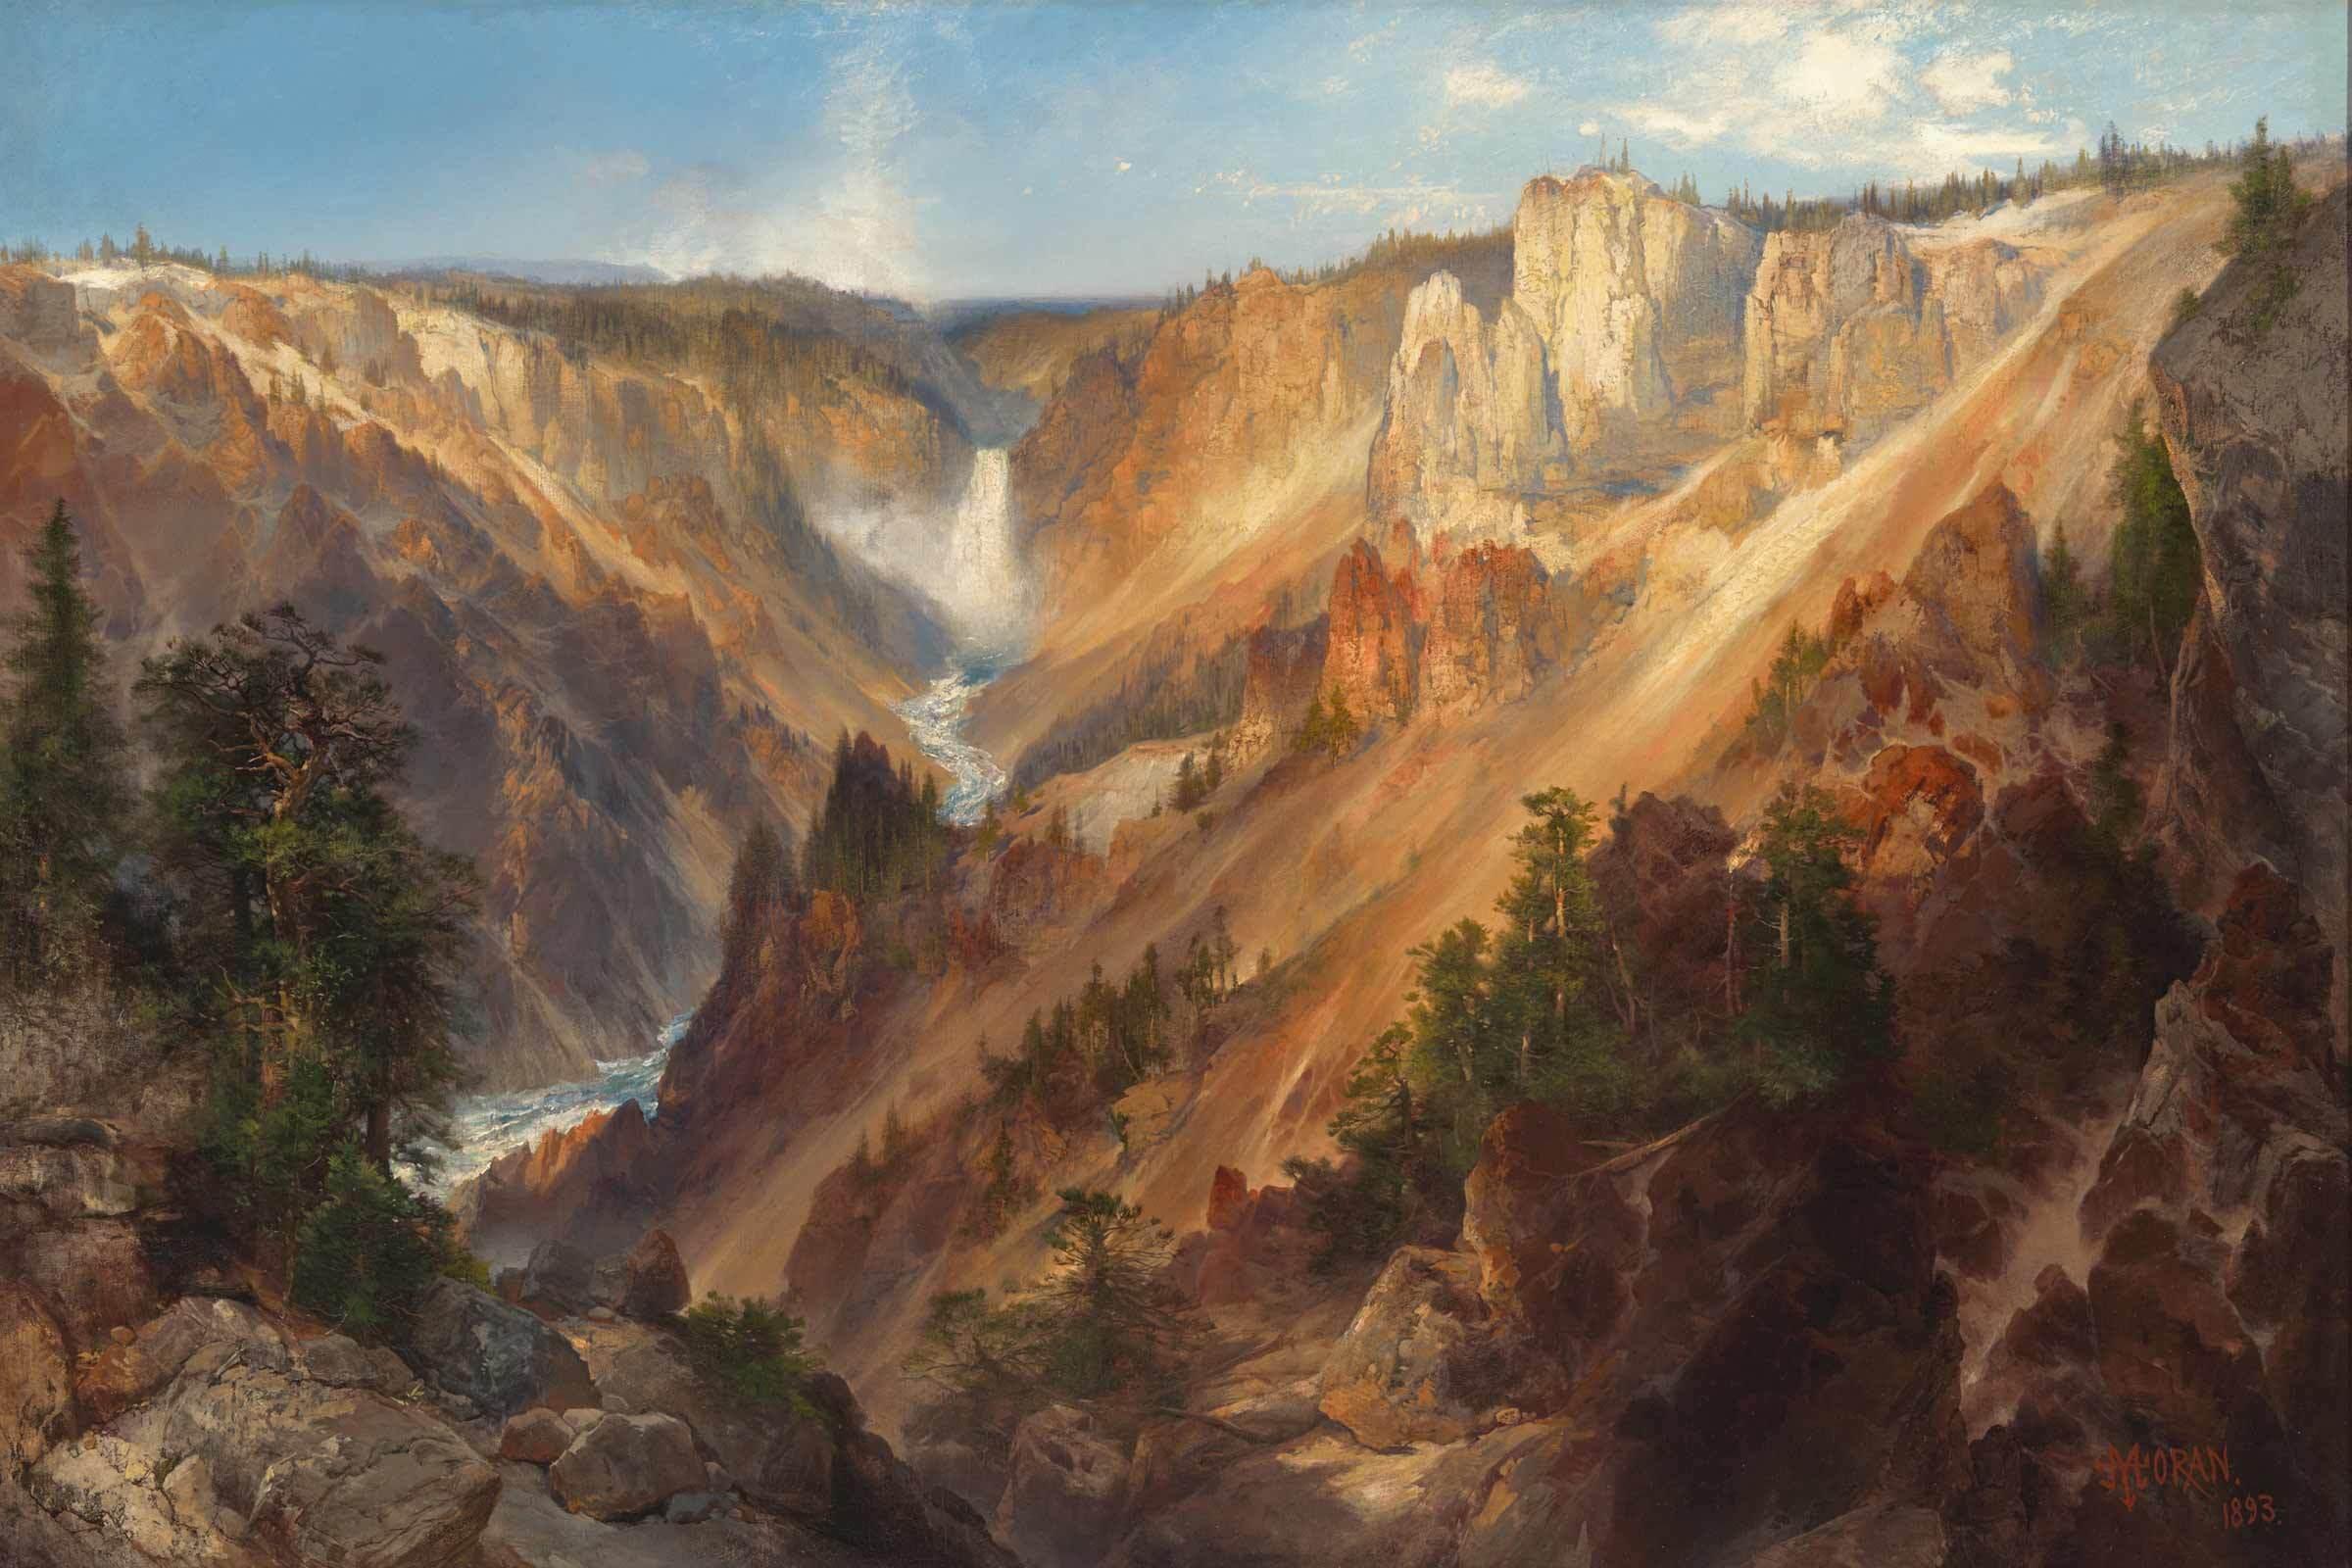 Lower Falls, Yellowstone Park, 1893